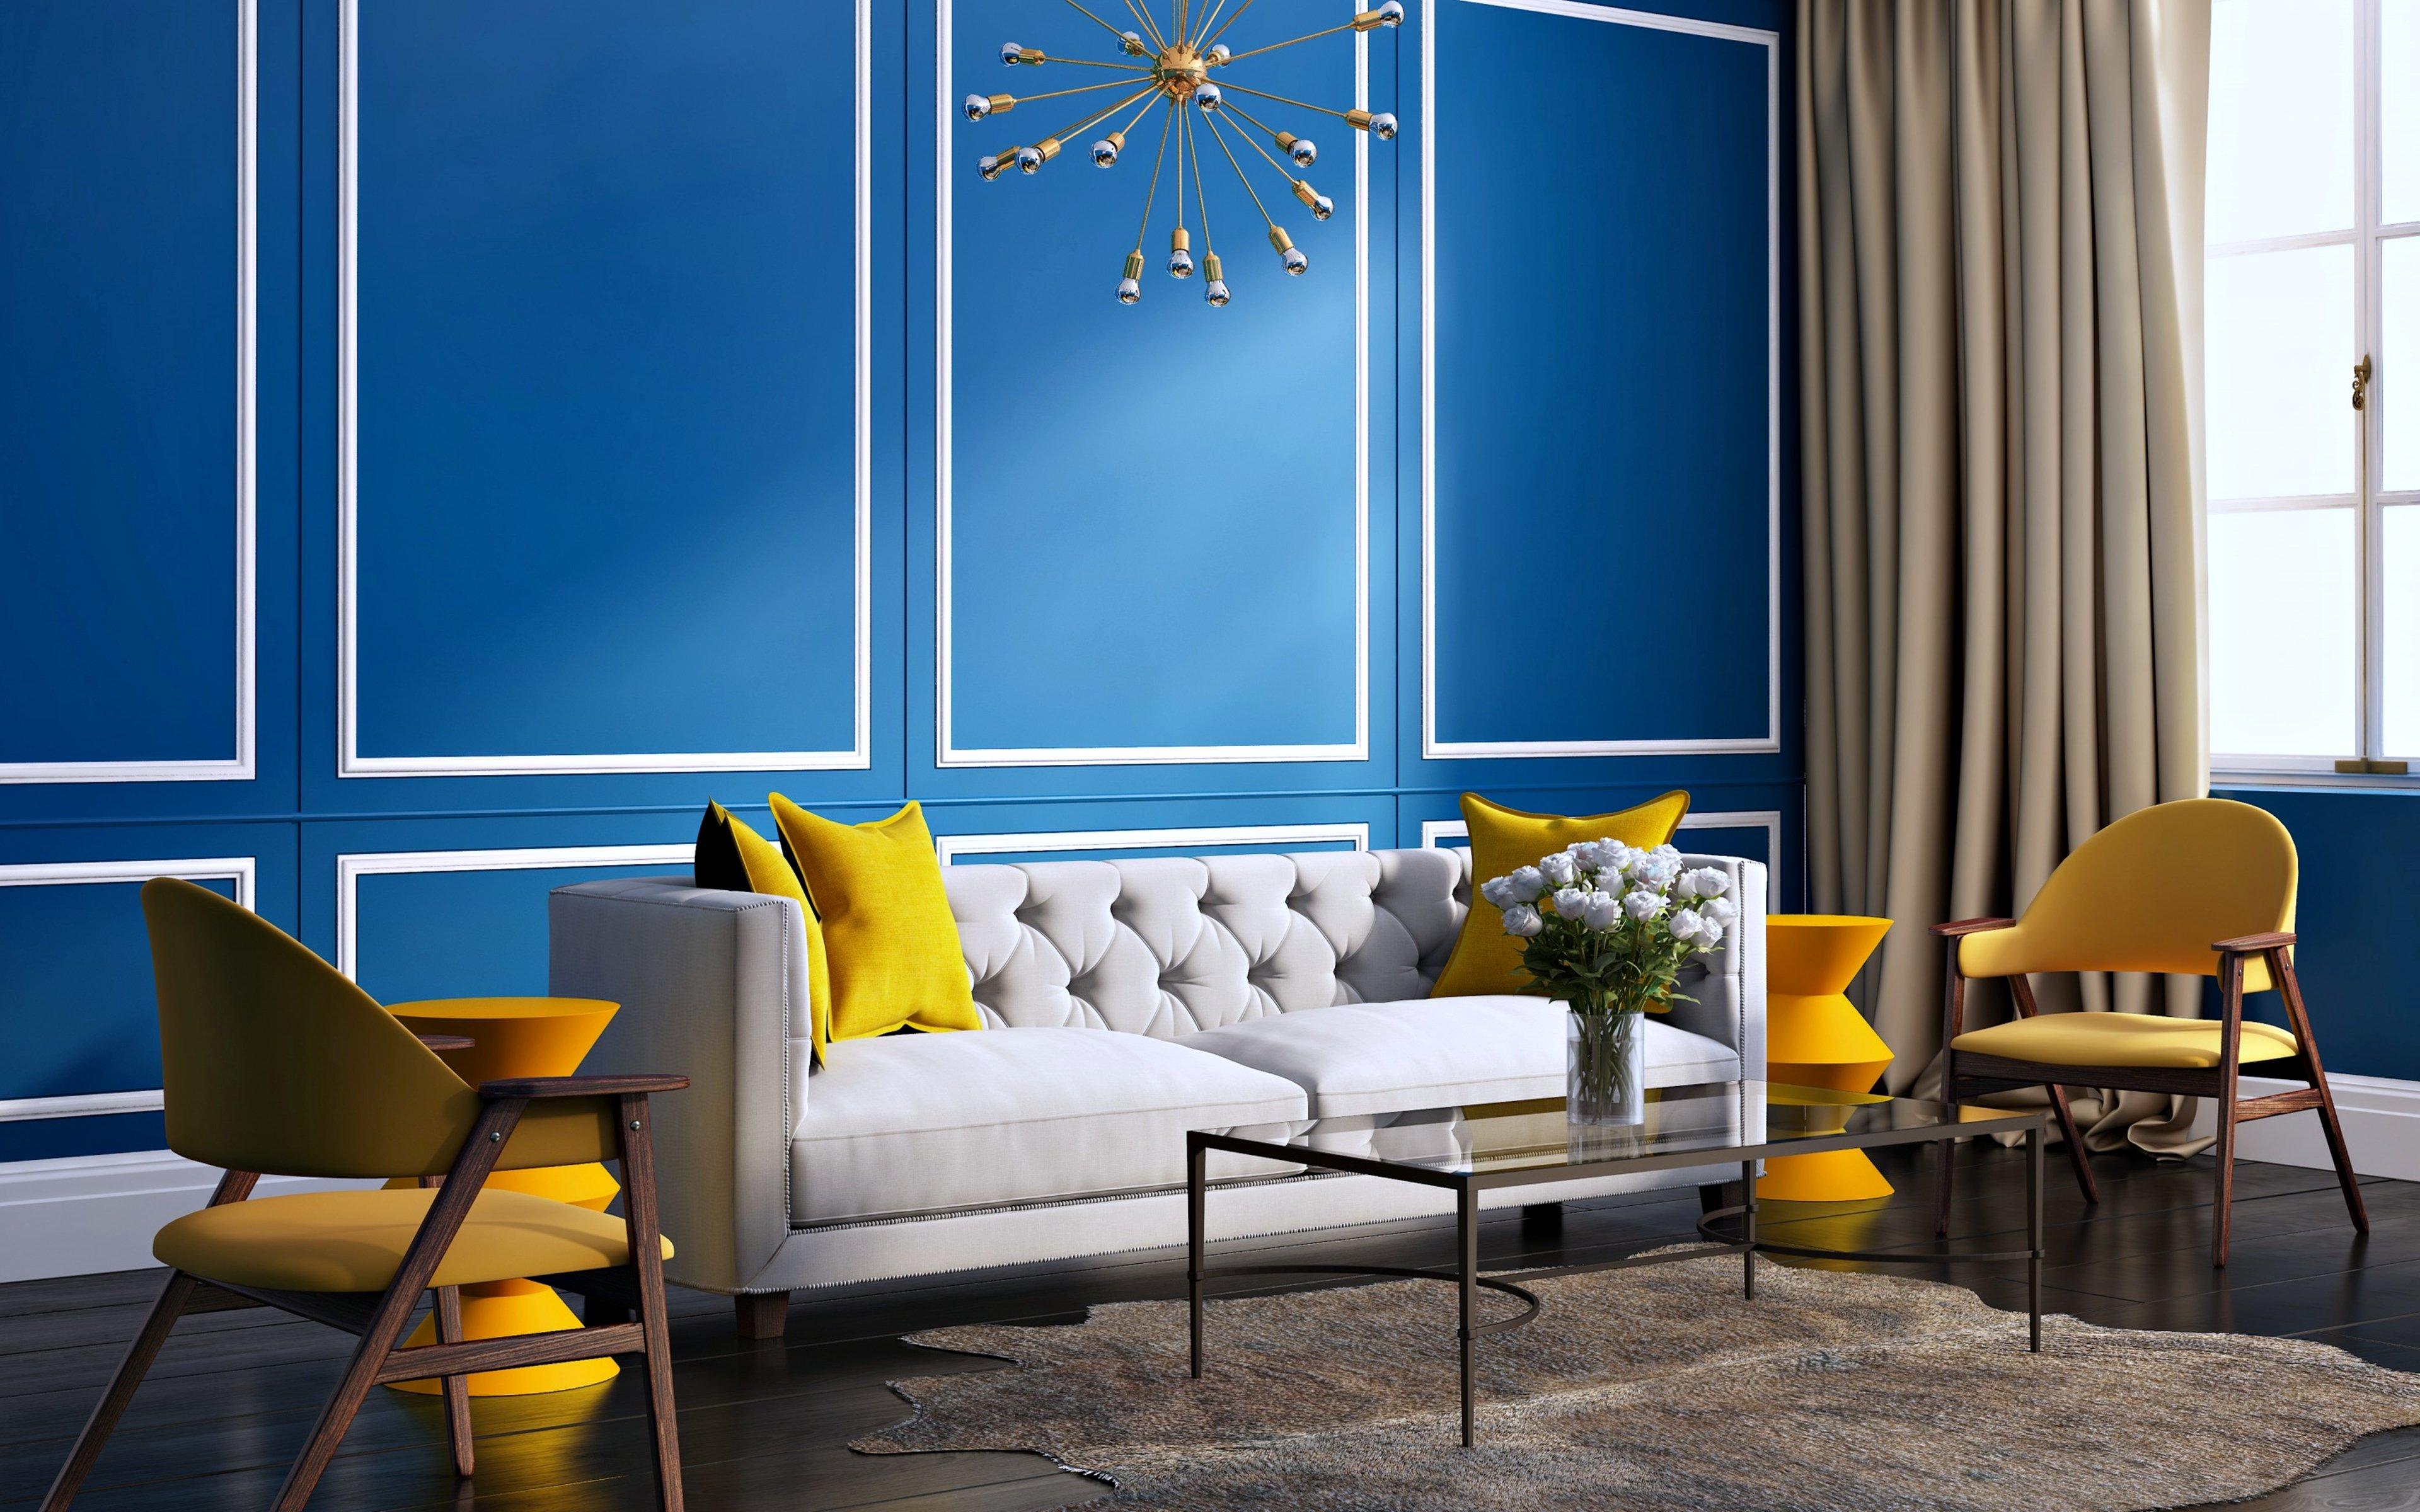 Best 3d Live Wallpaper For Pc Furniture Wallpapers Hd Free Download Pixelstalk Net